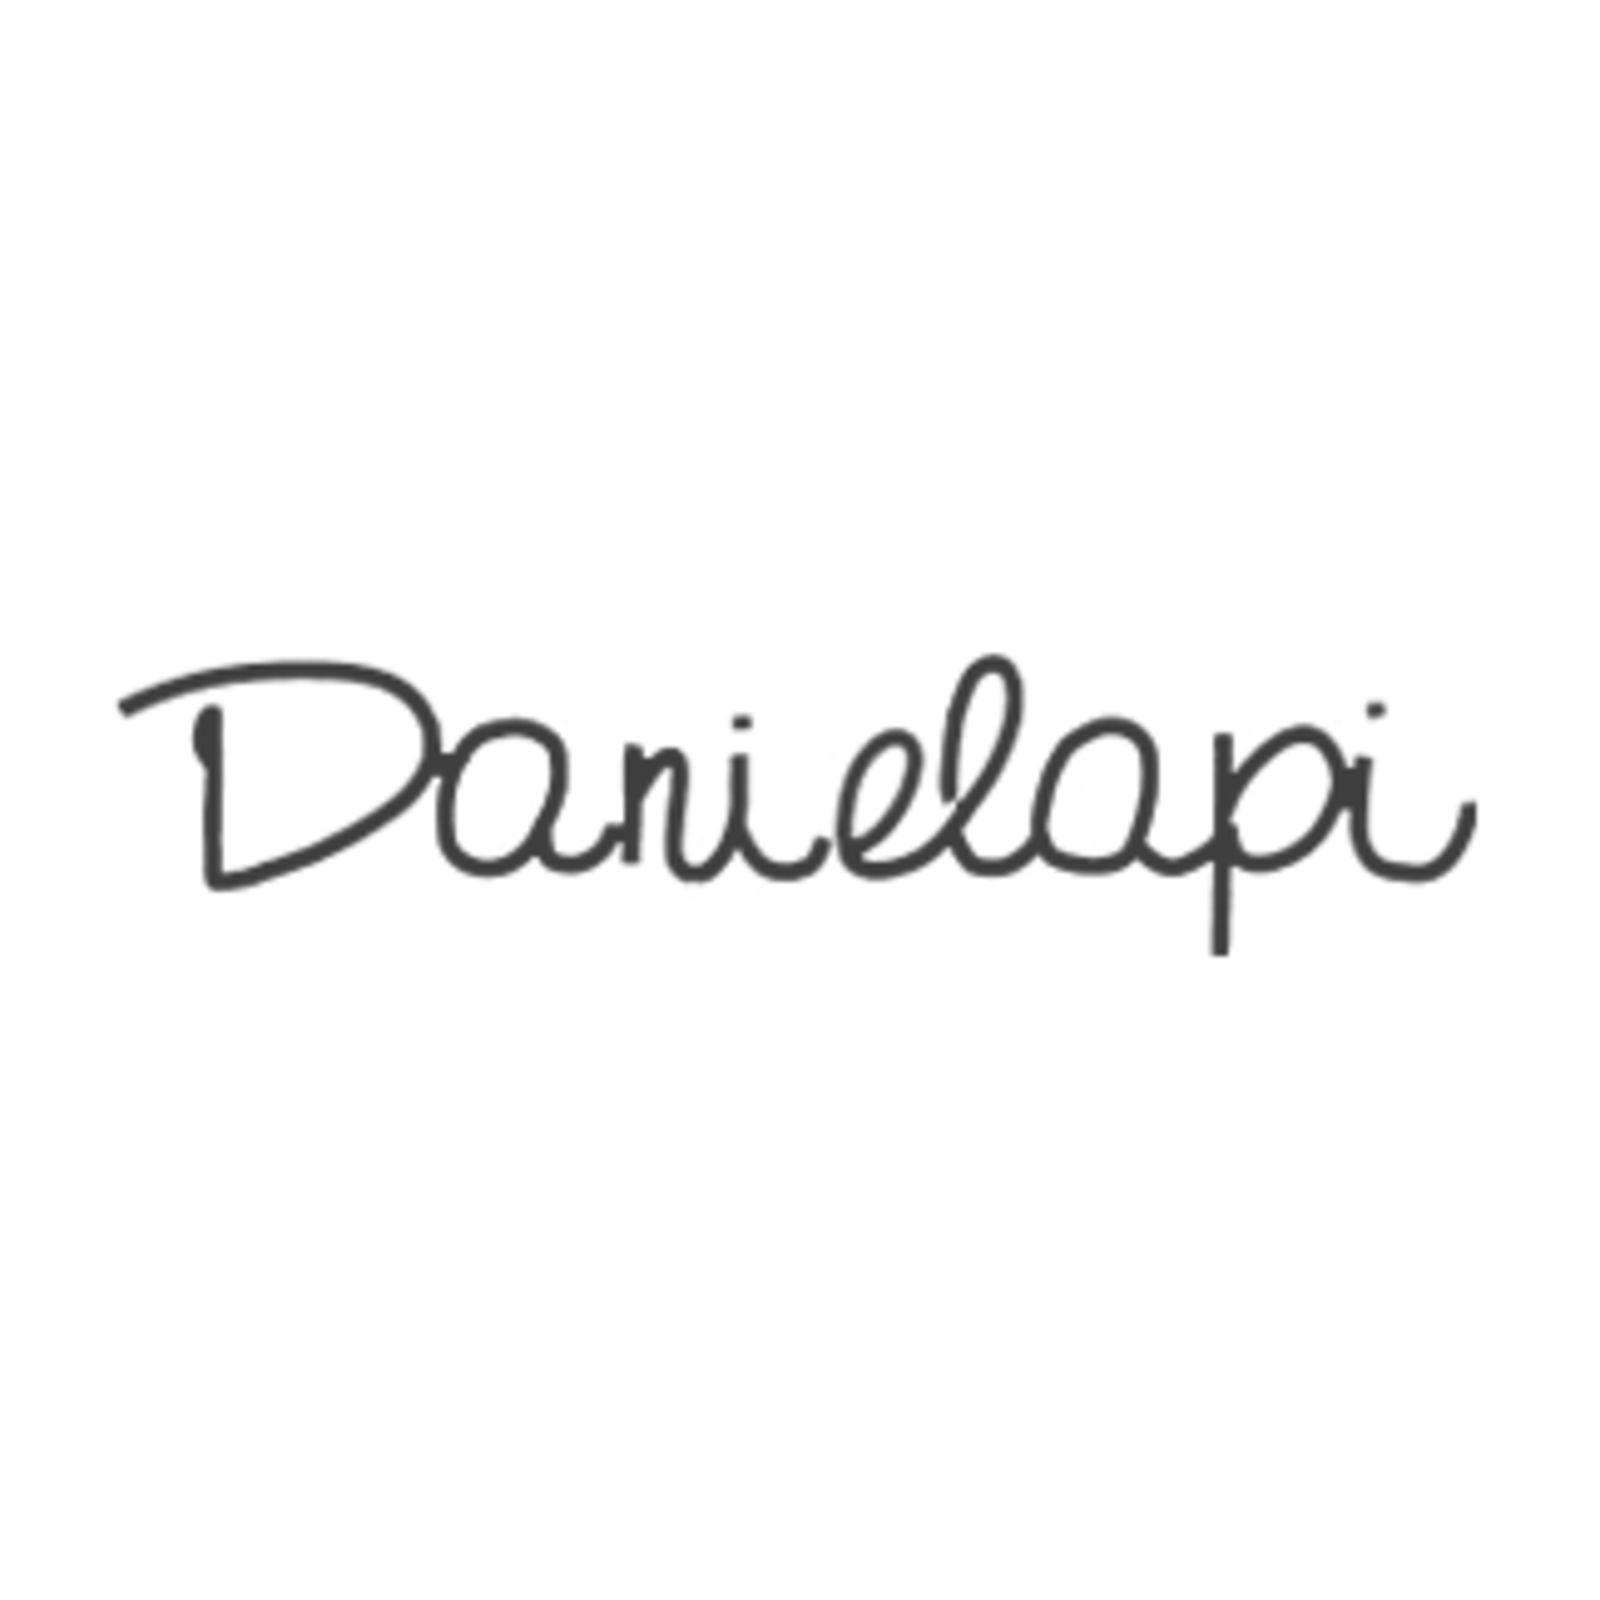 Danielapi